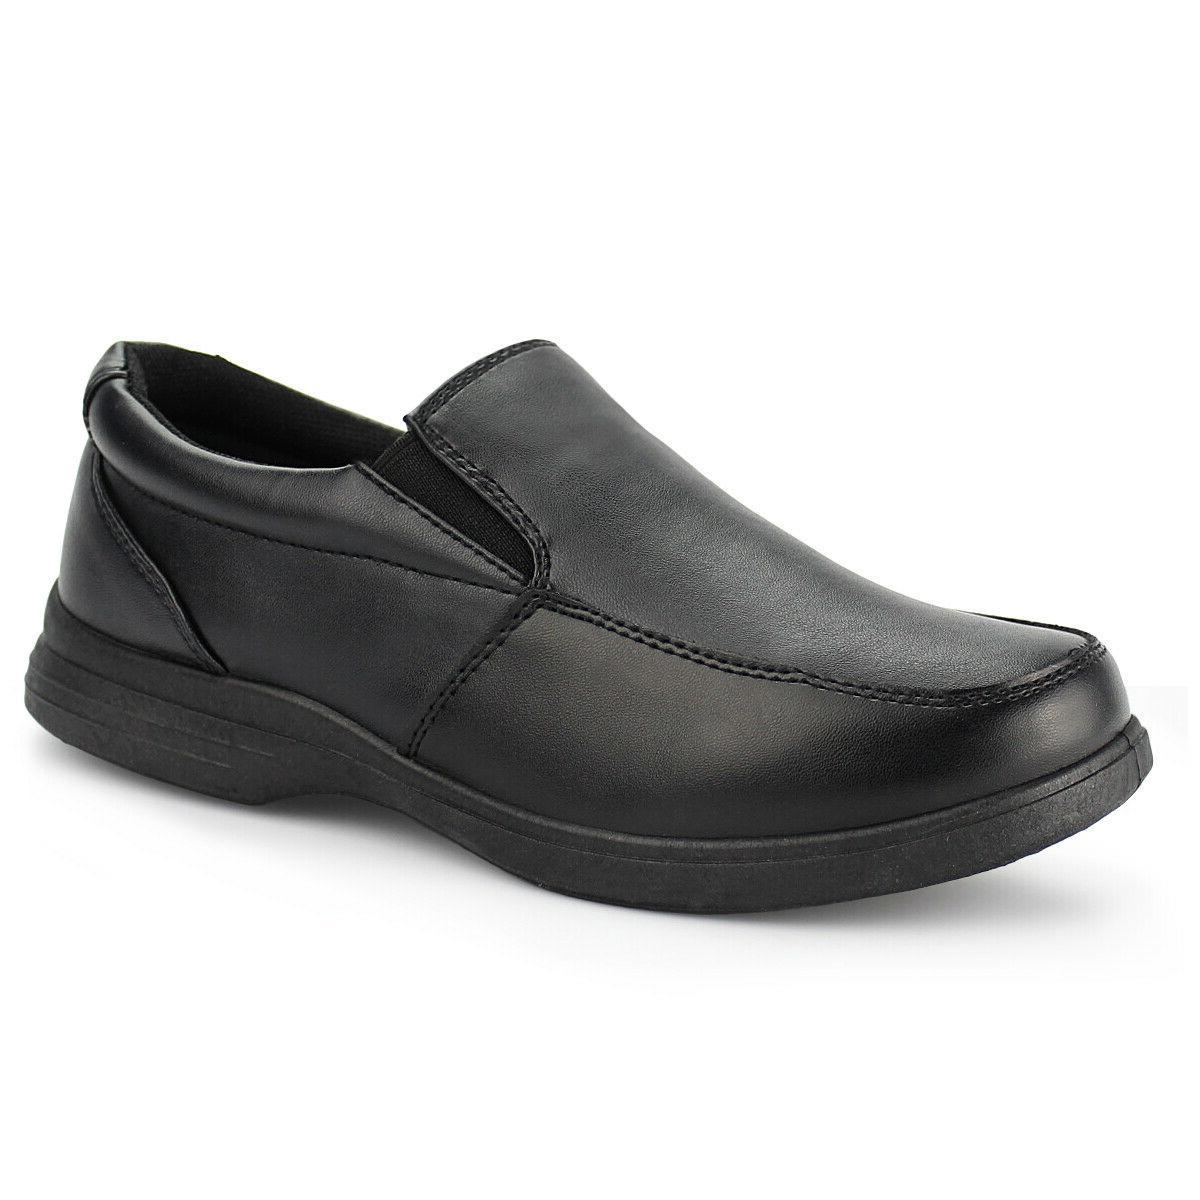 Boys Black School Uniform Shoes Kids Classic Slip On Dress O